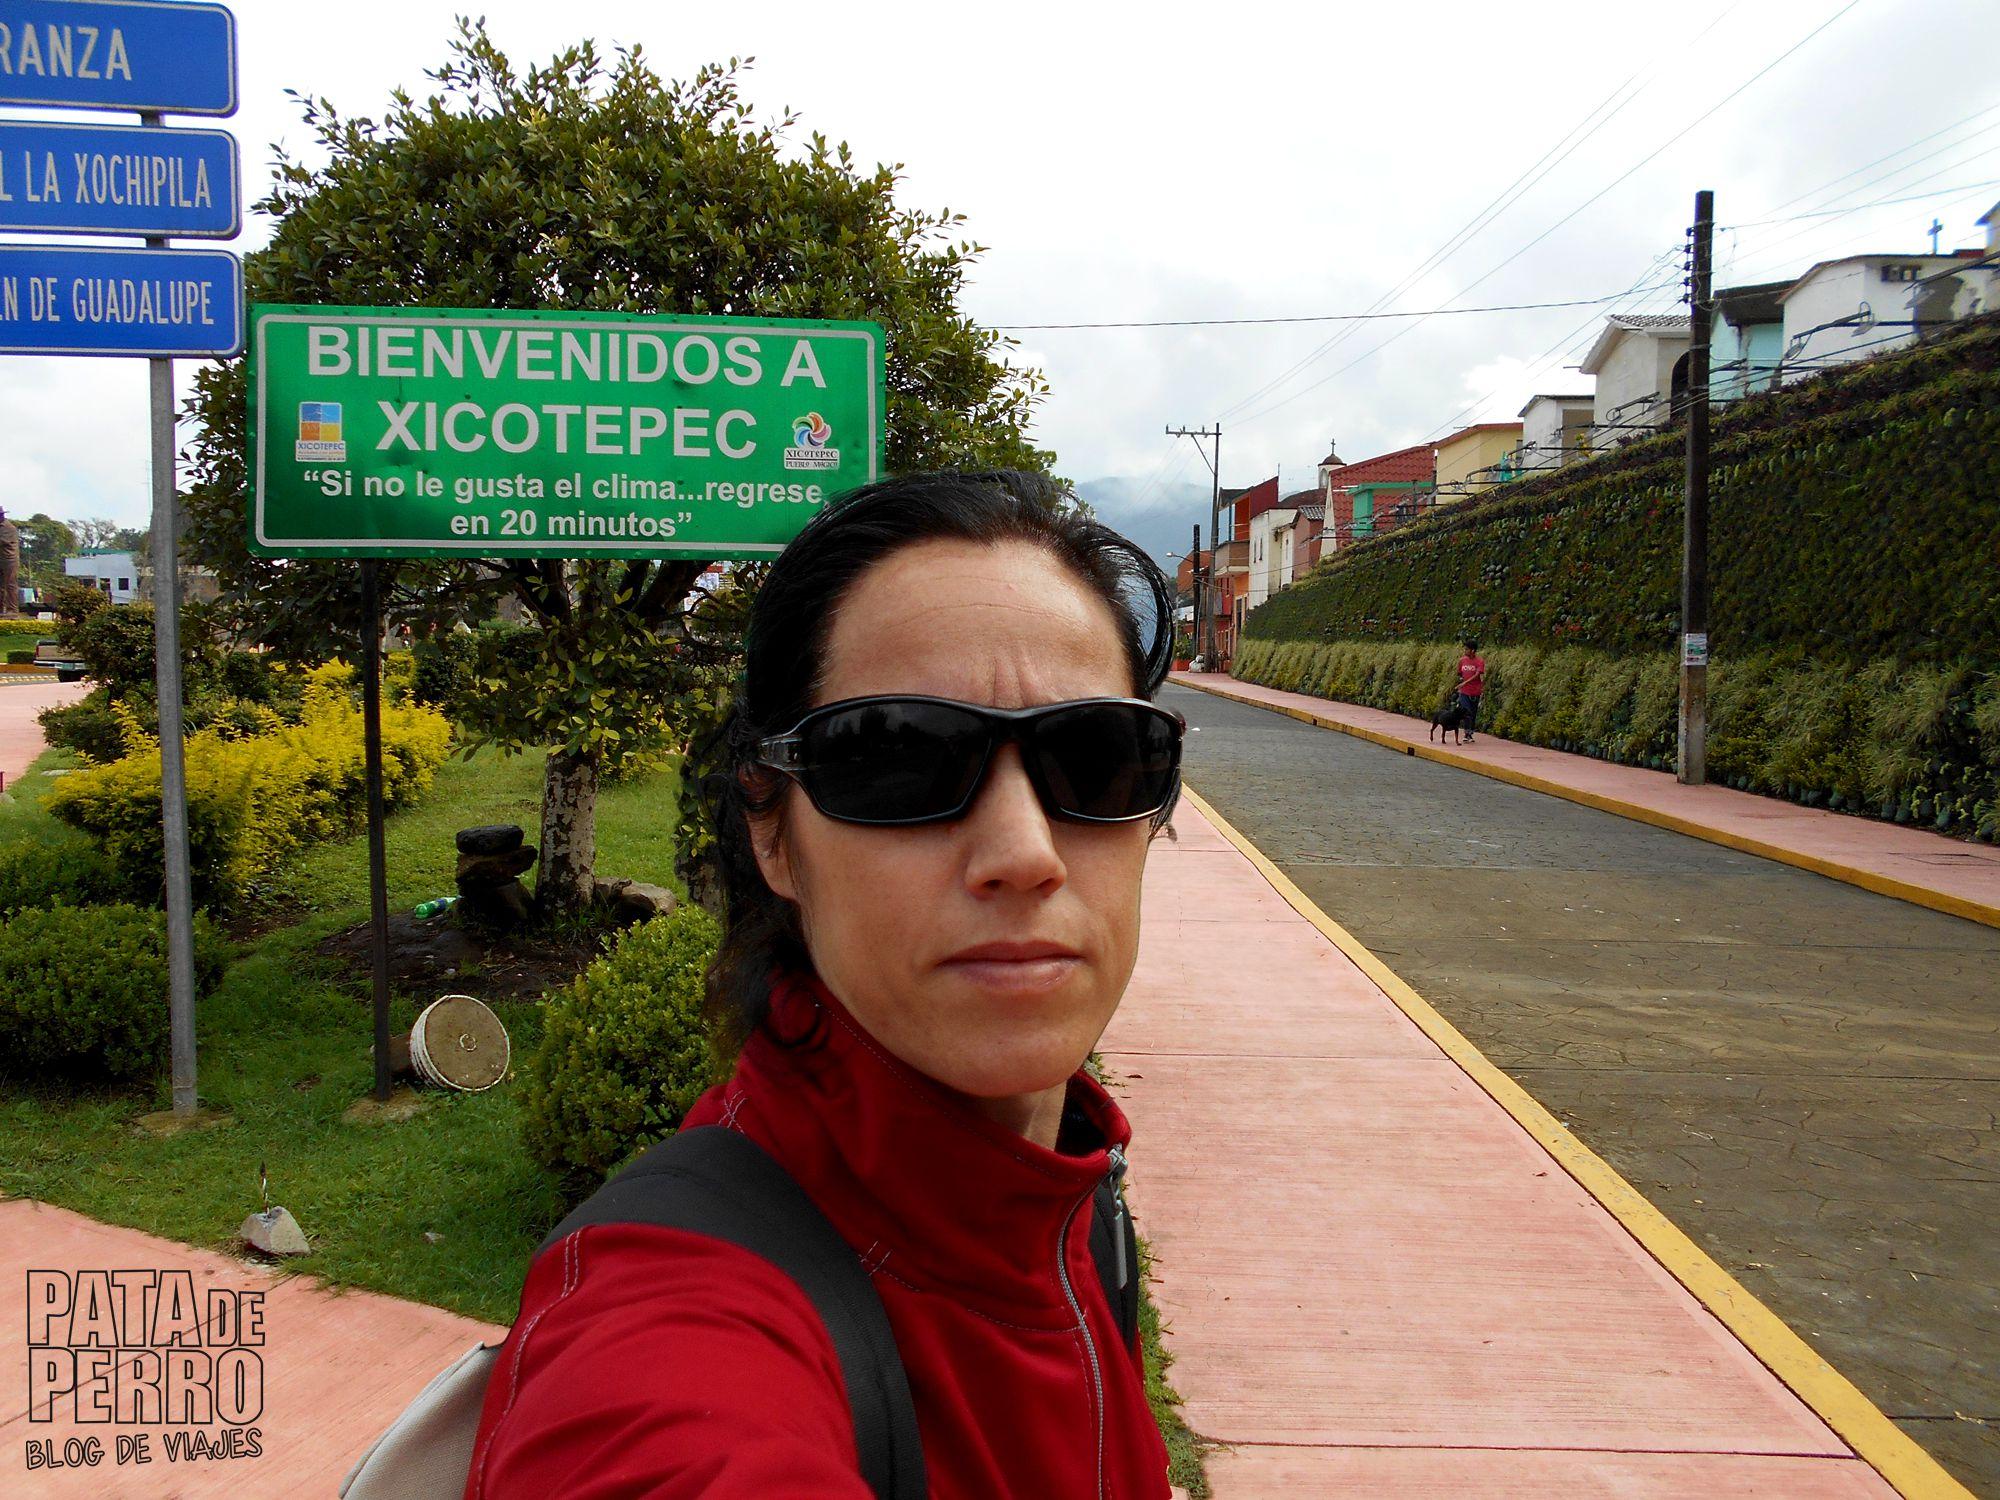 bienvenido a xicotepec